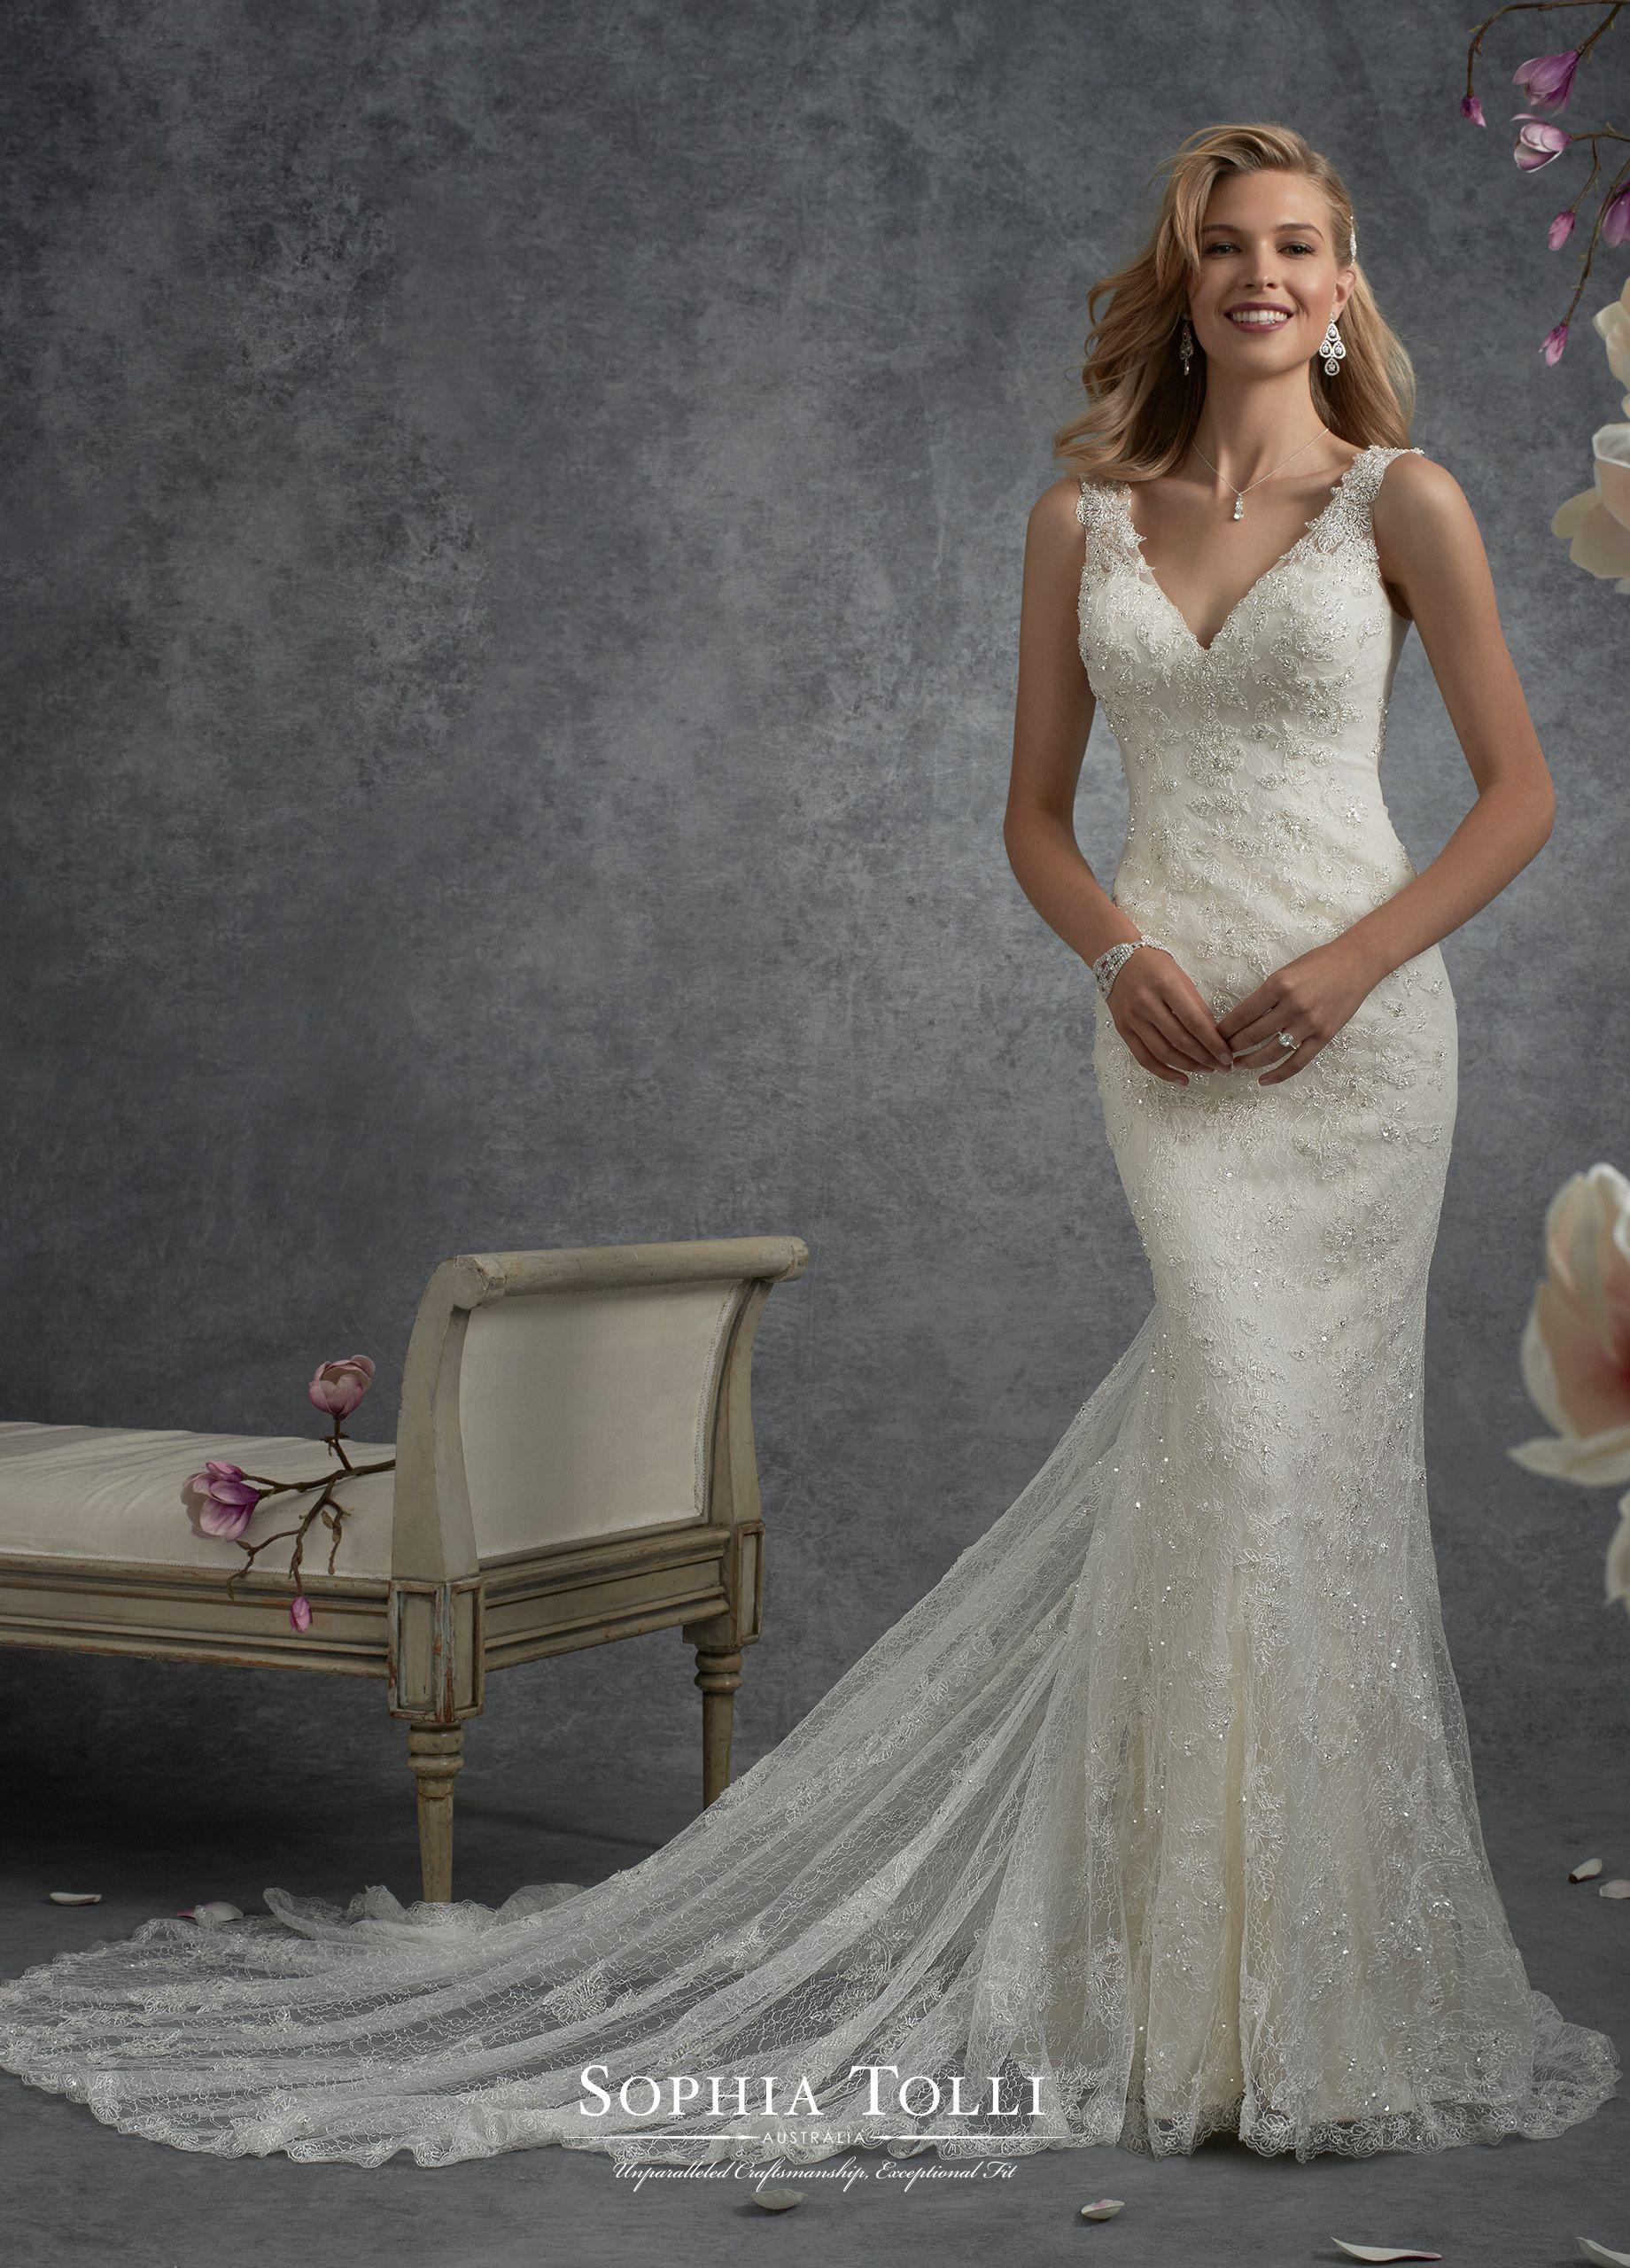 Bridal Dresses Sophia Tolli Sophia Tolli Wedding Dresses Mermaid Wedding Dress Fit And Flare Wedding Dress